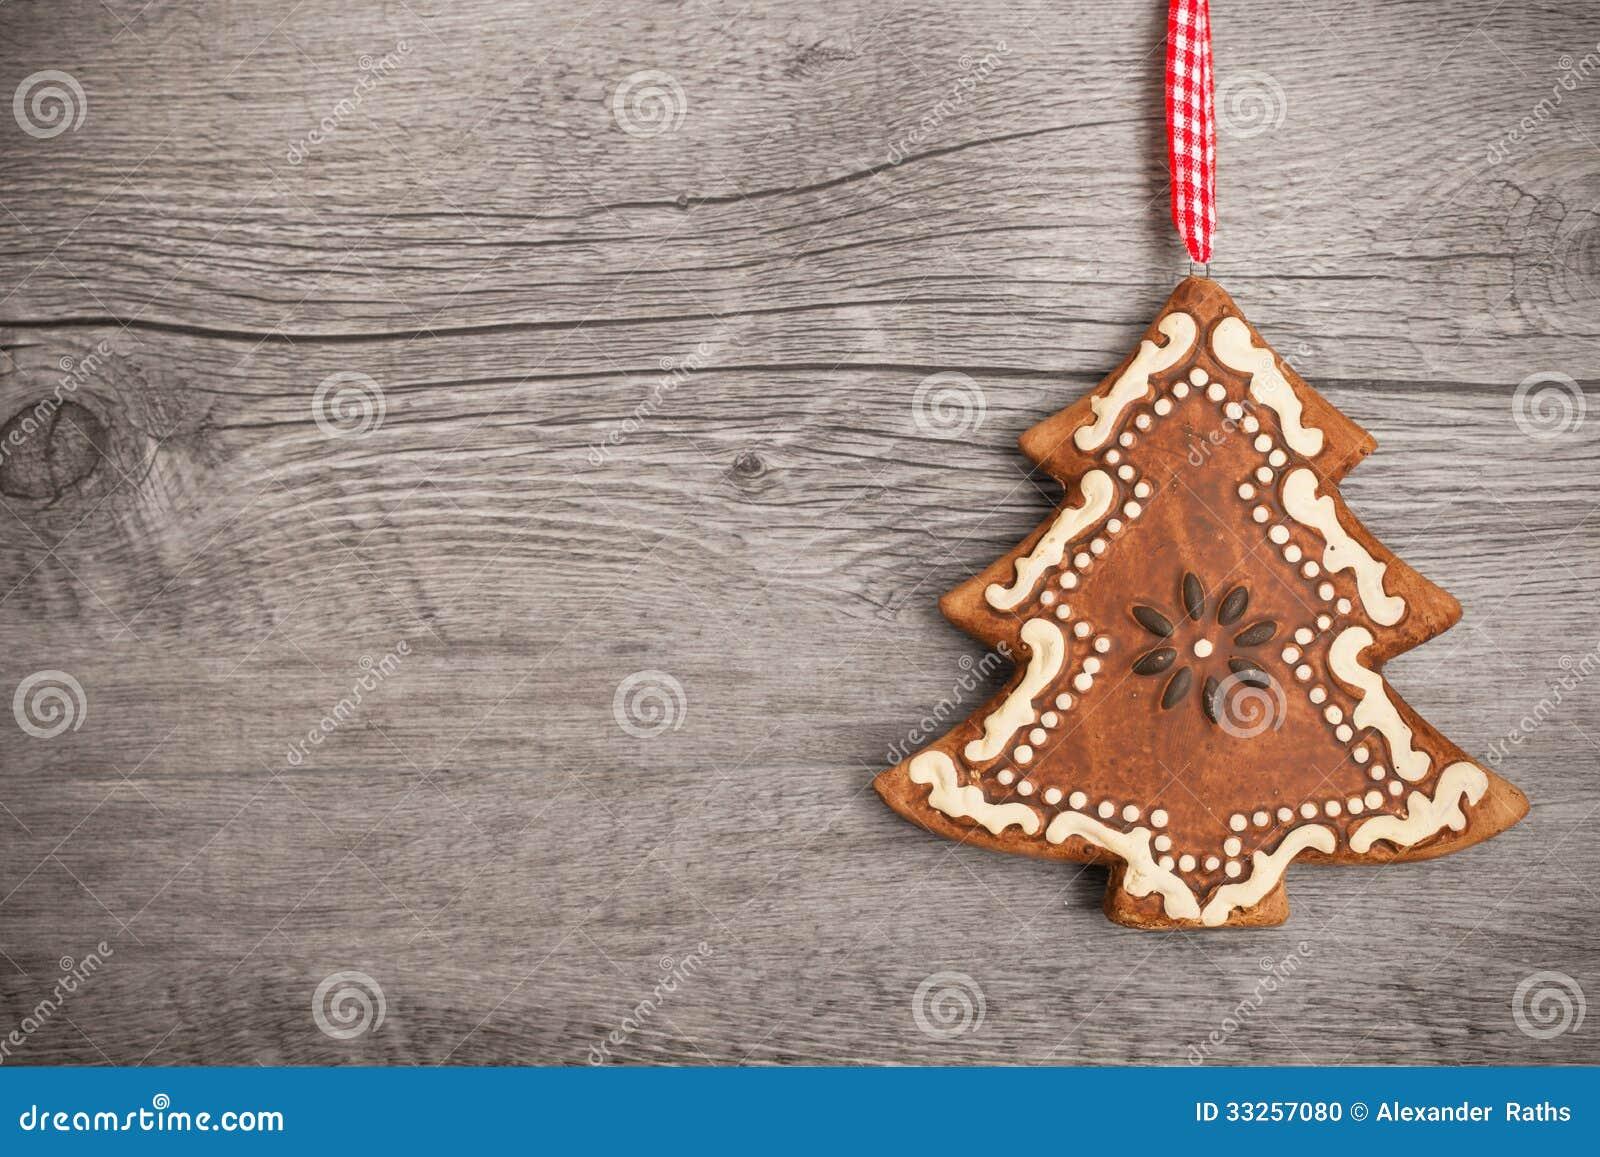 Gingerbread Christmas Tree Stock Photos - Image: 30179623